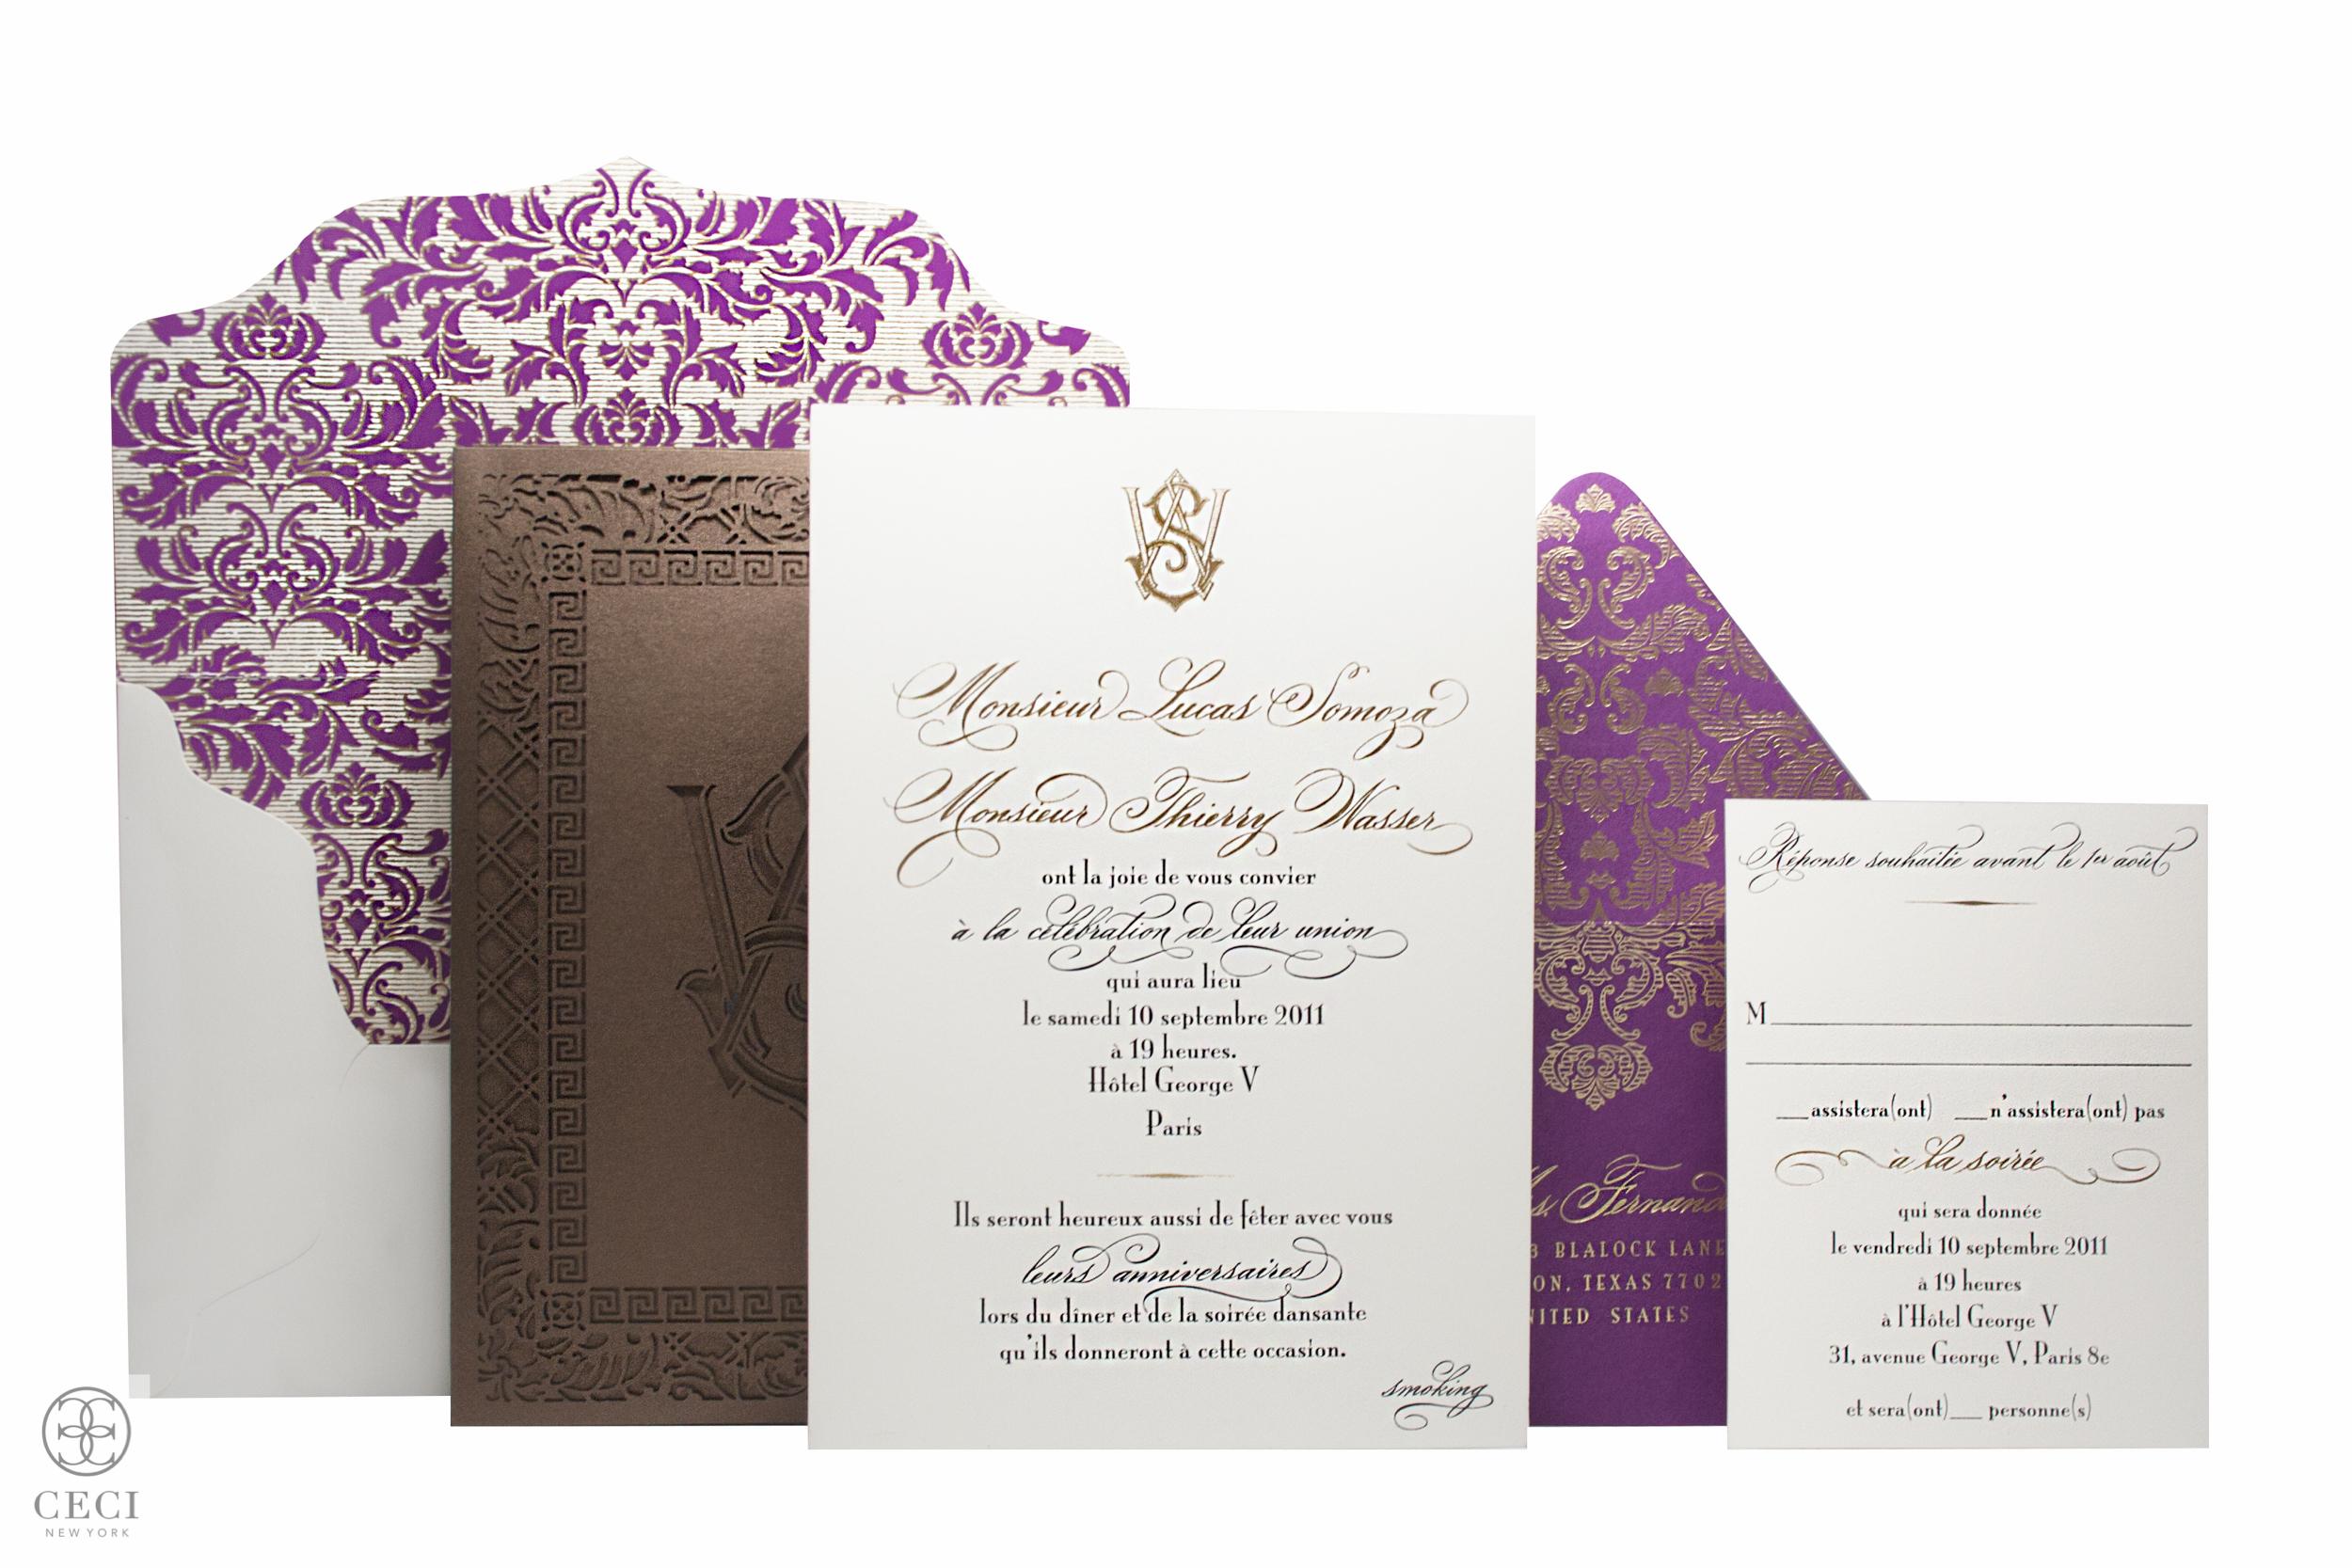 ceci_new_york_lucas_somoza_purple_regal_wediding_birthday_commitment_ceremony_invitation_logo_branding_perfume_gold_-1.jpg